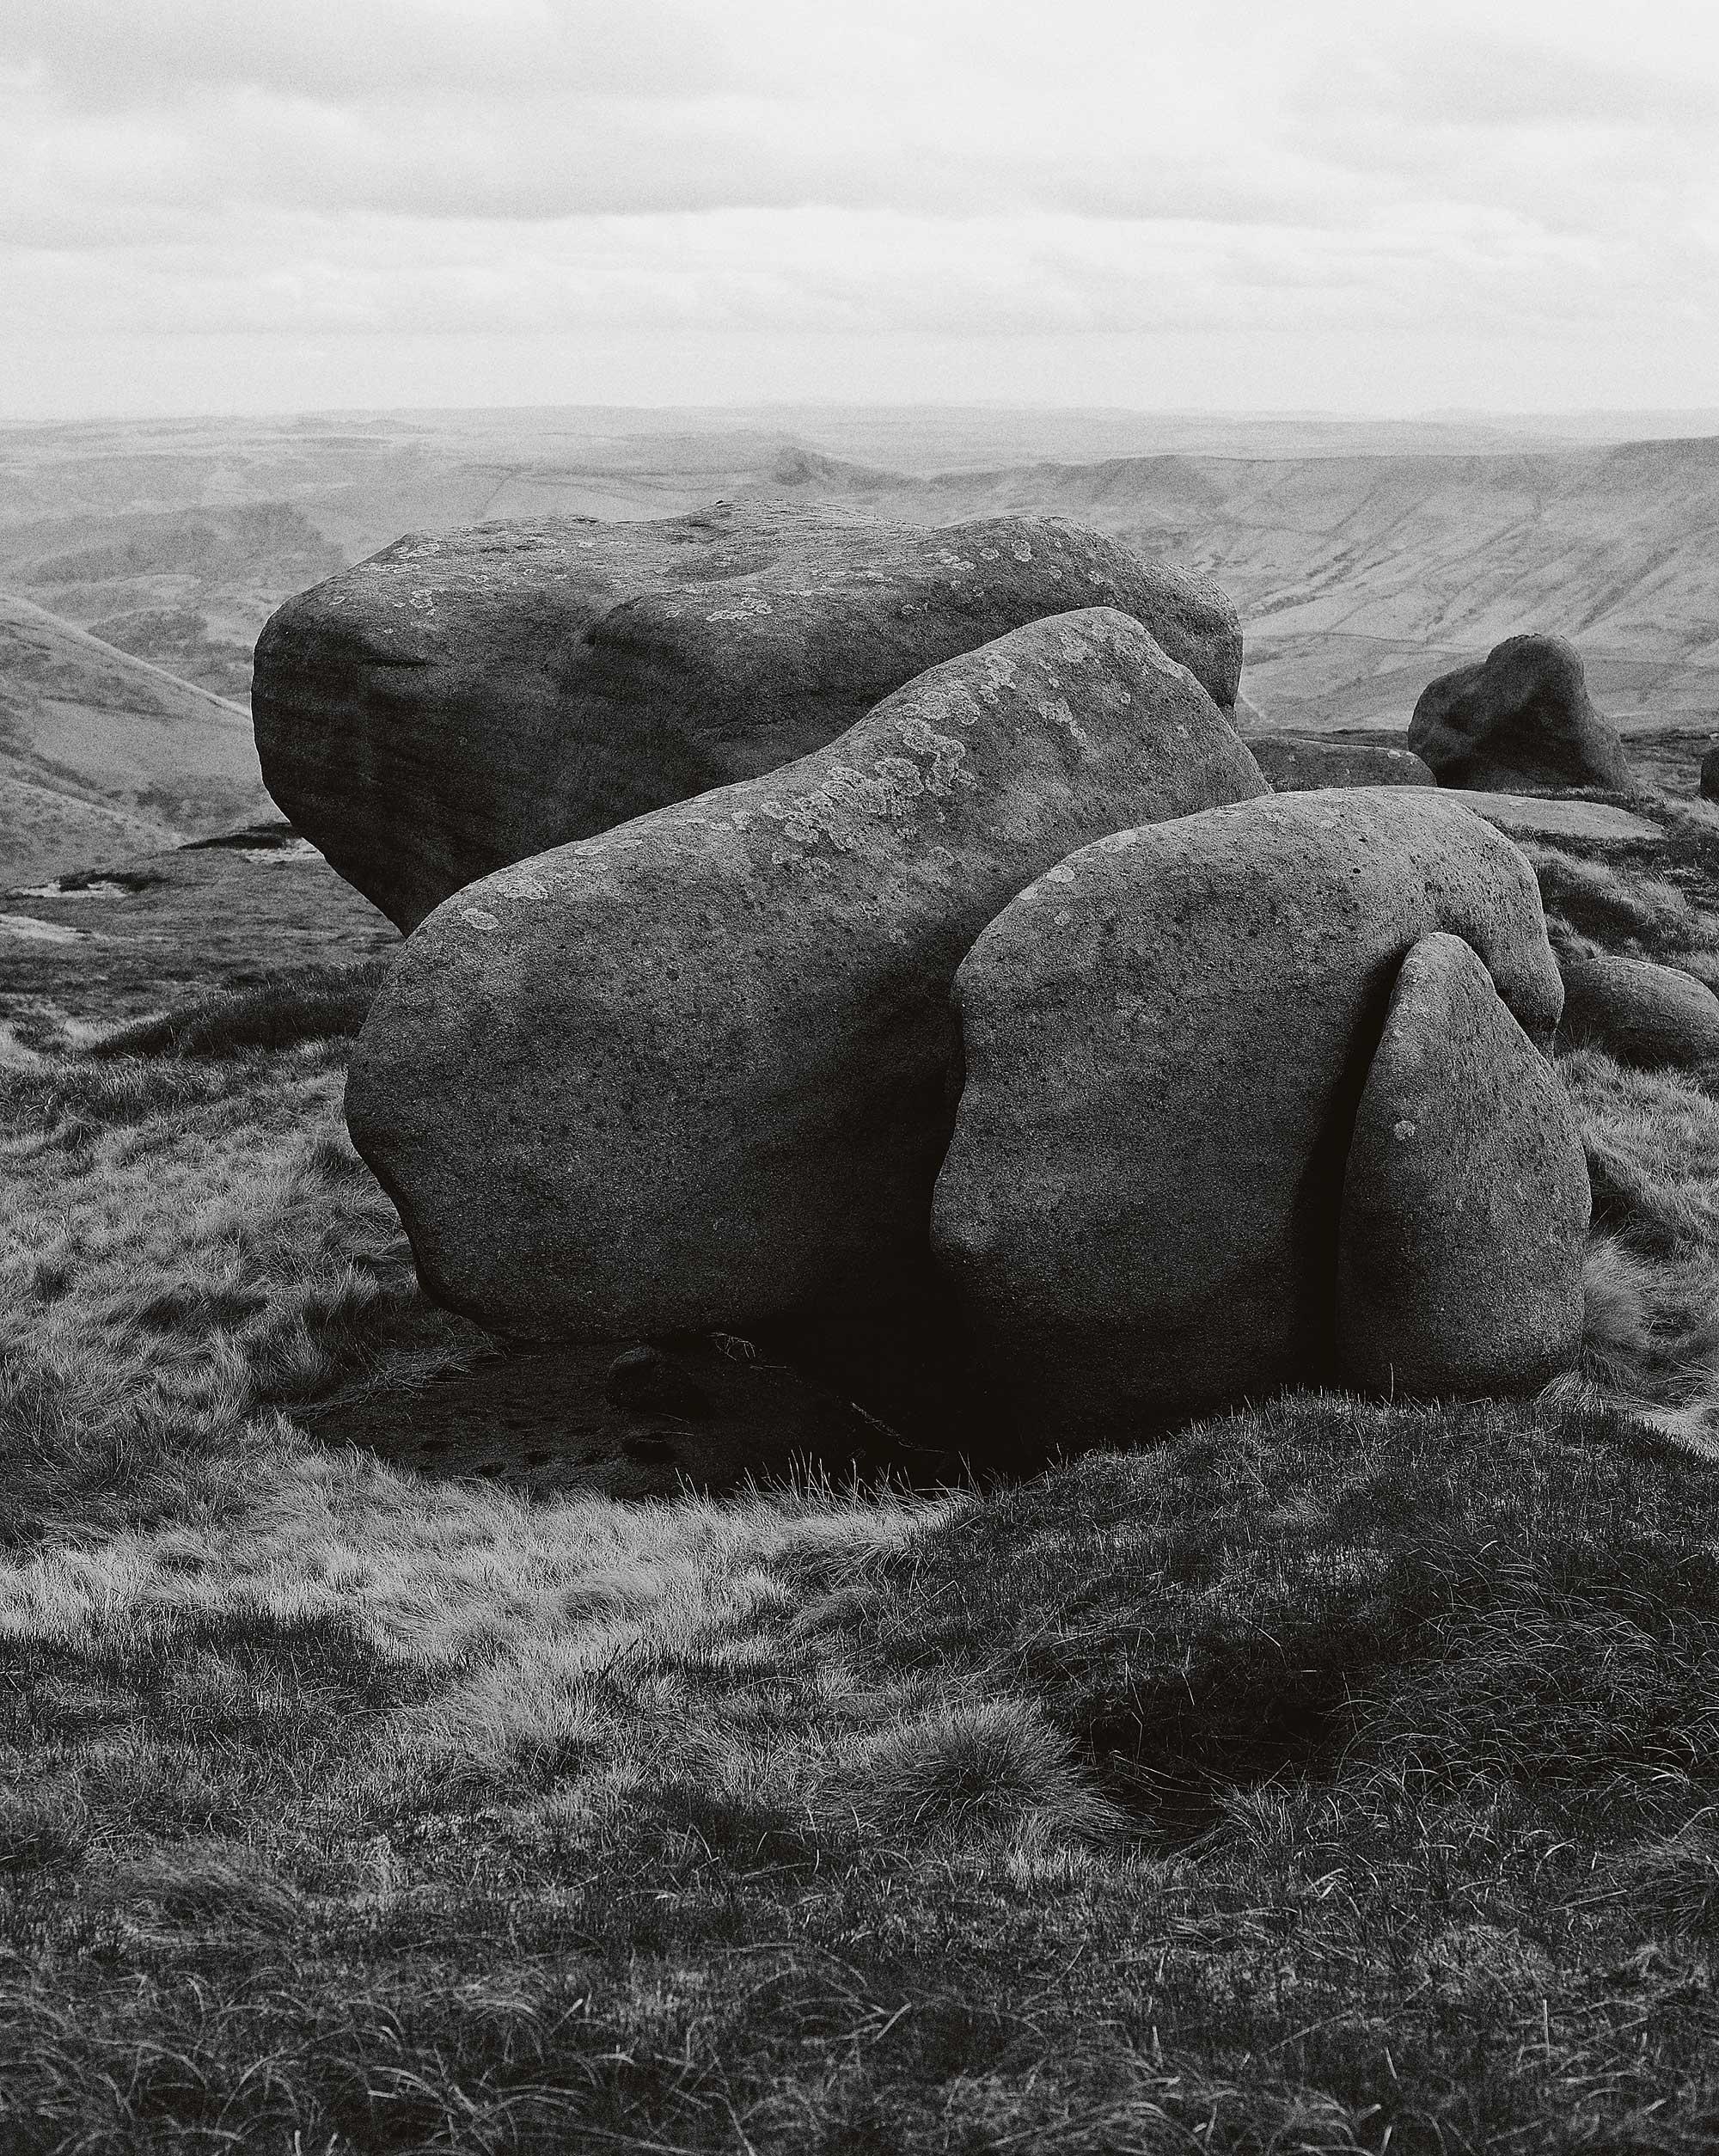 Peak District landscape with large rocks